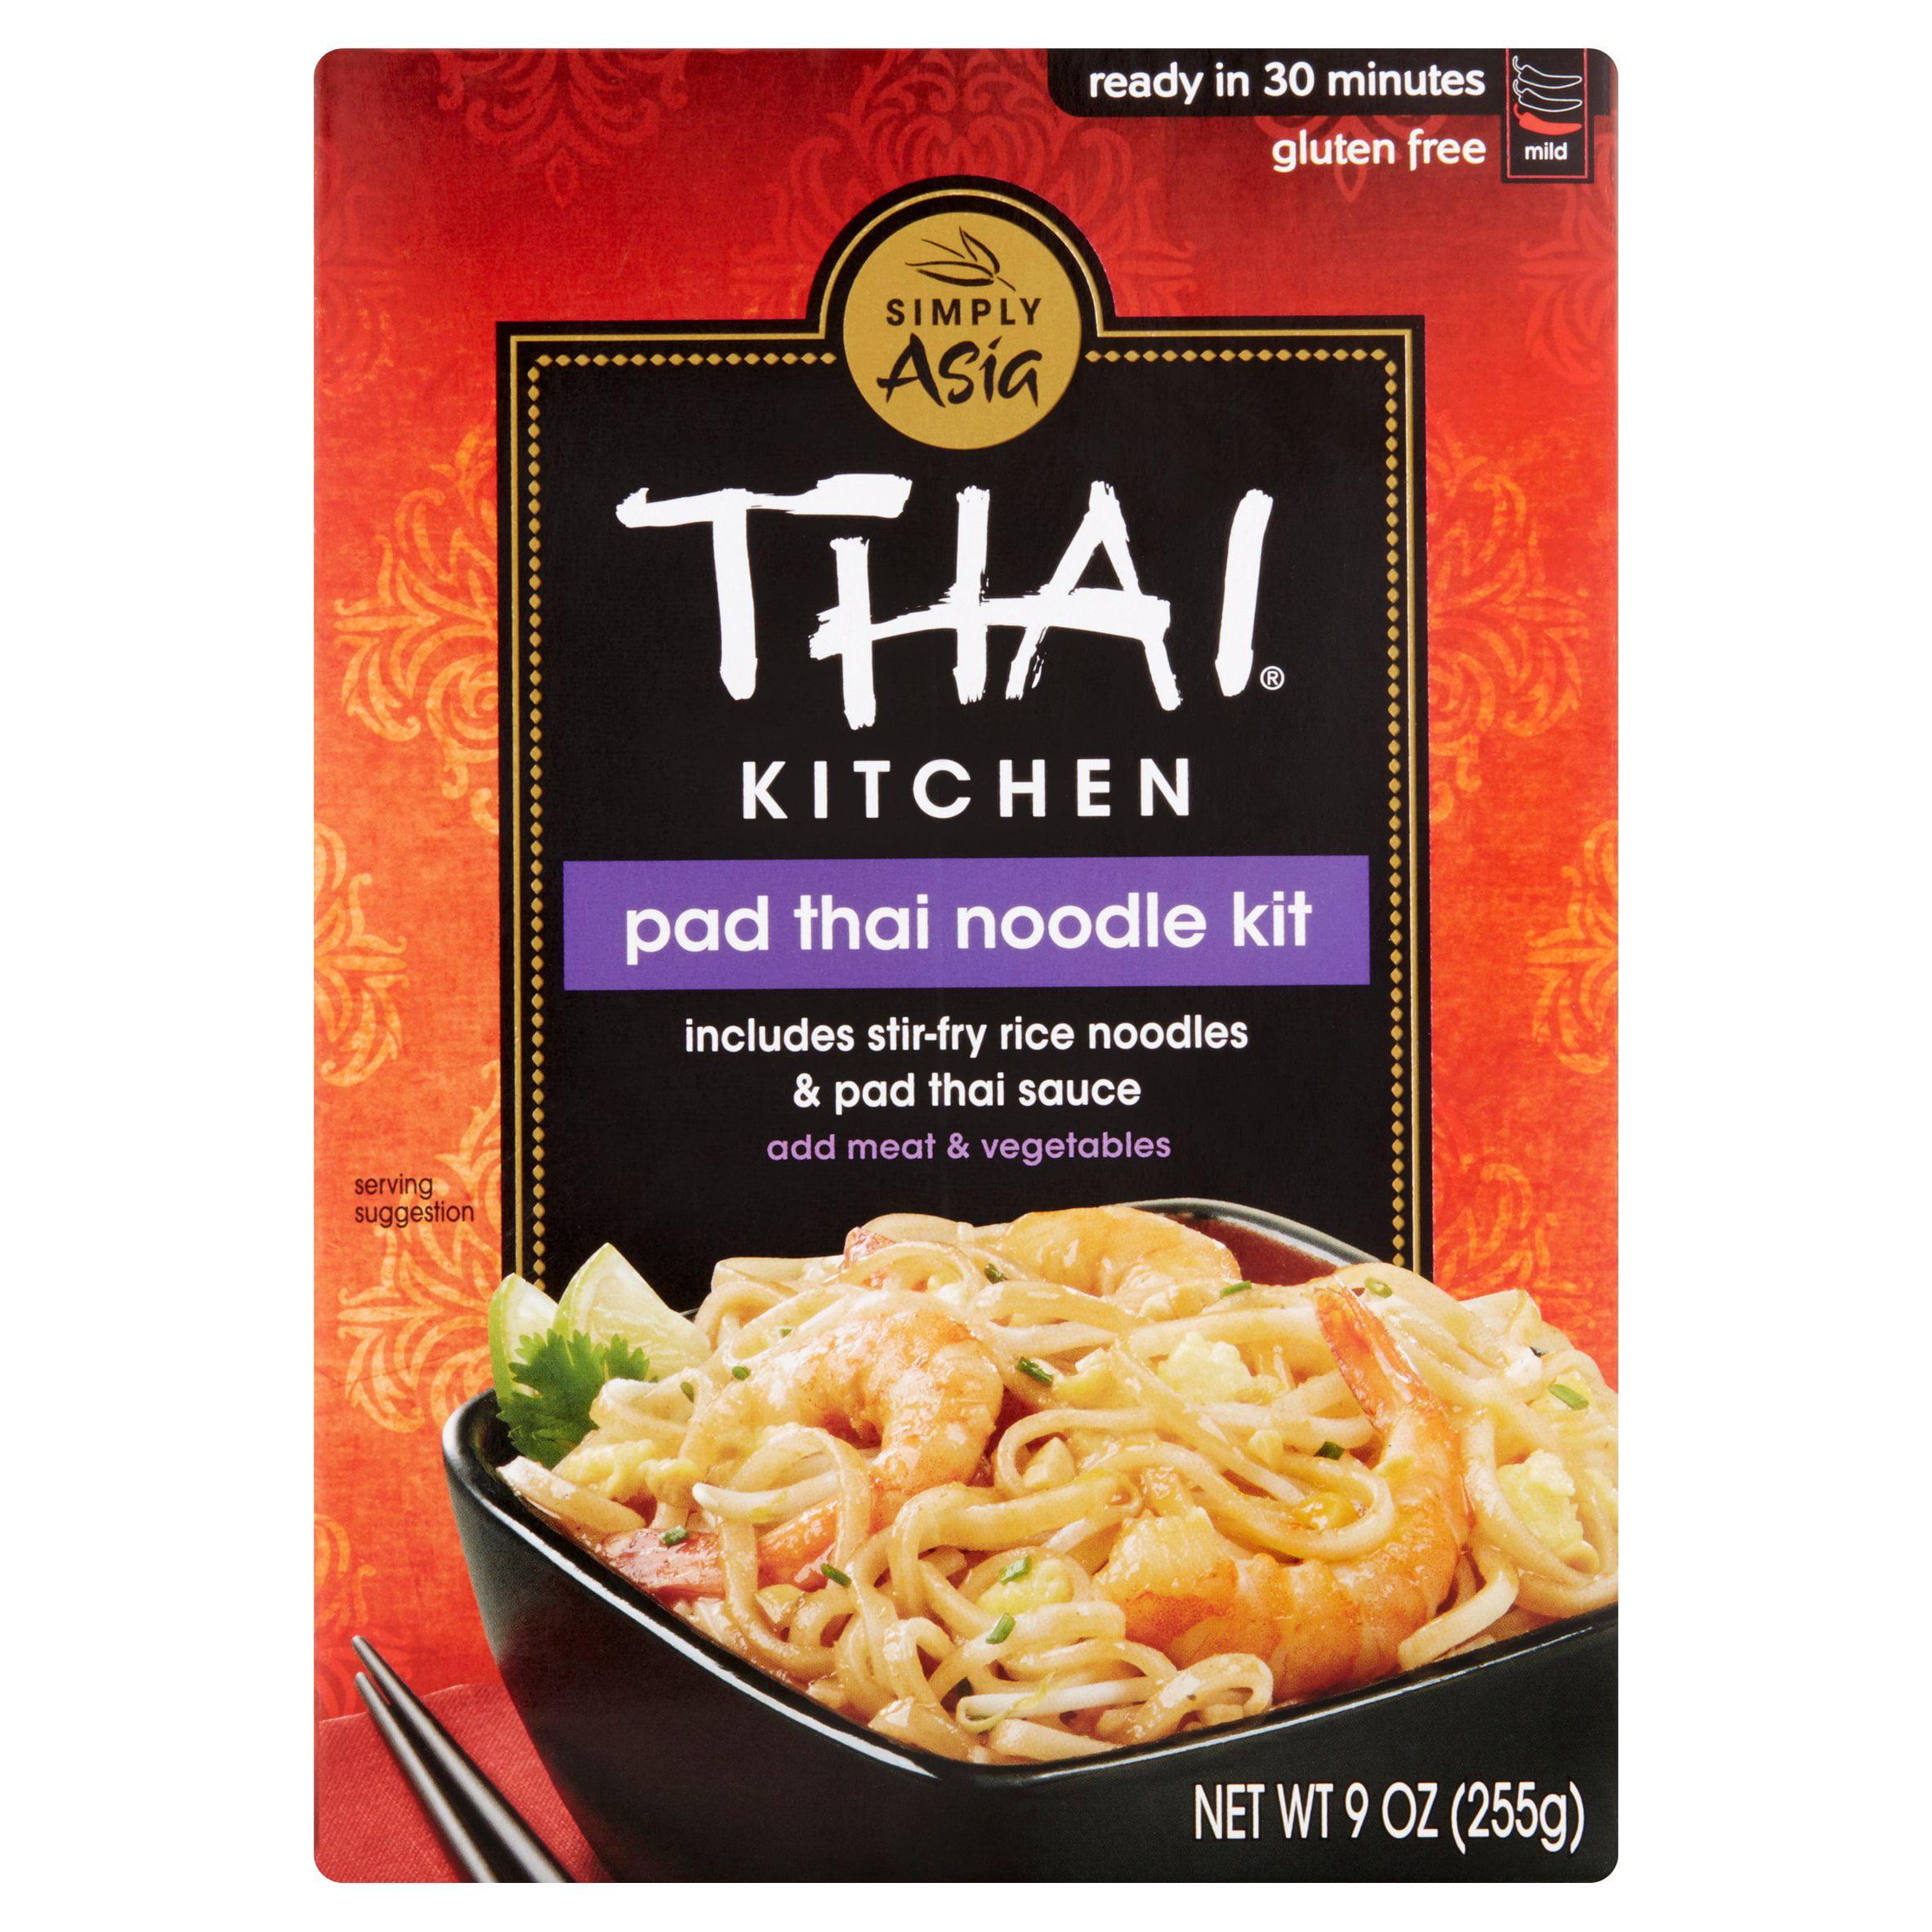 Thai Kitchen Pad Thai thai kitchen gluten free original pad thai stir fry noodles, 9 oz